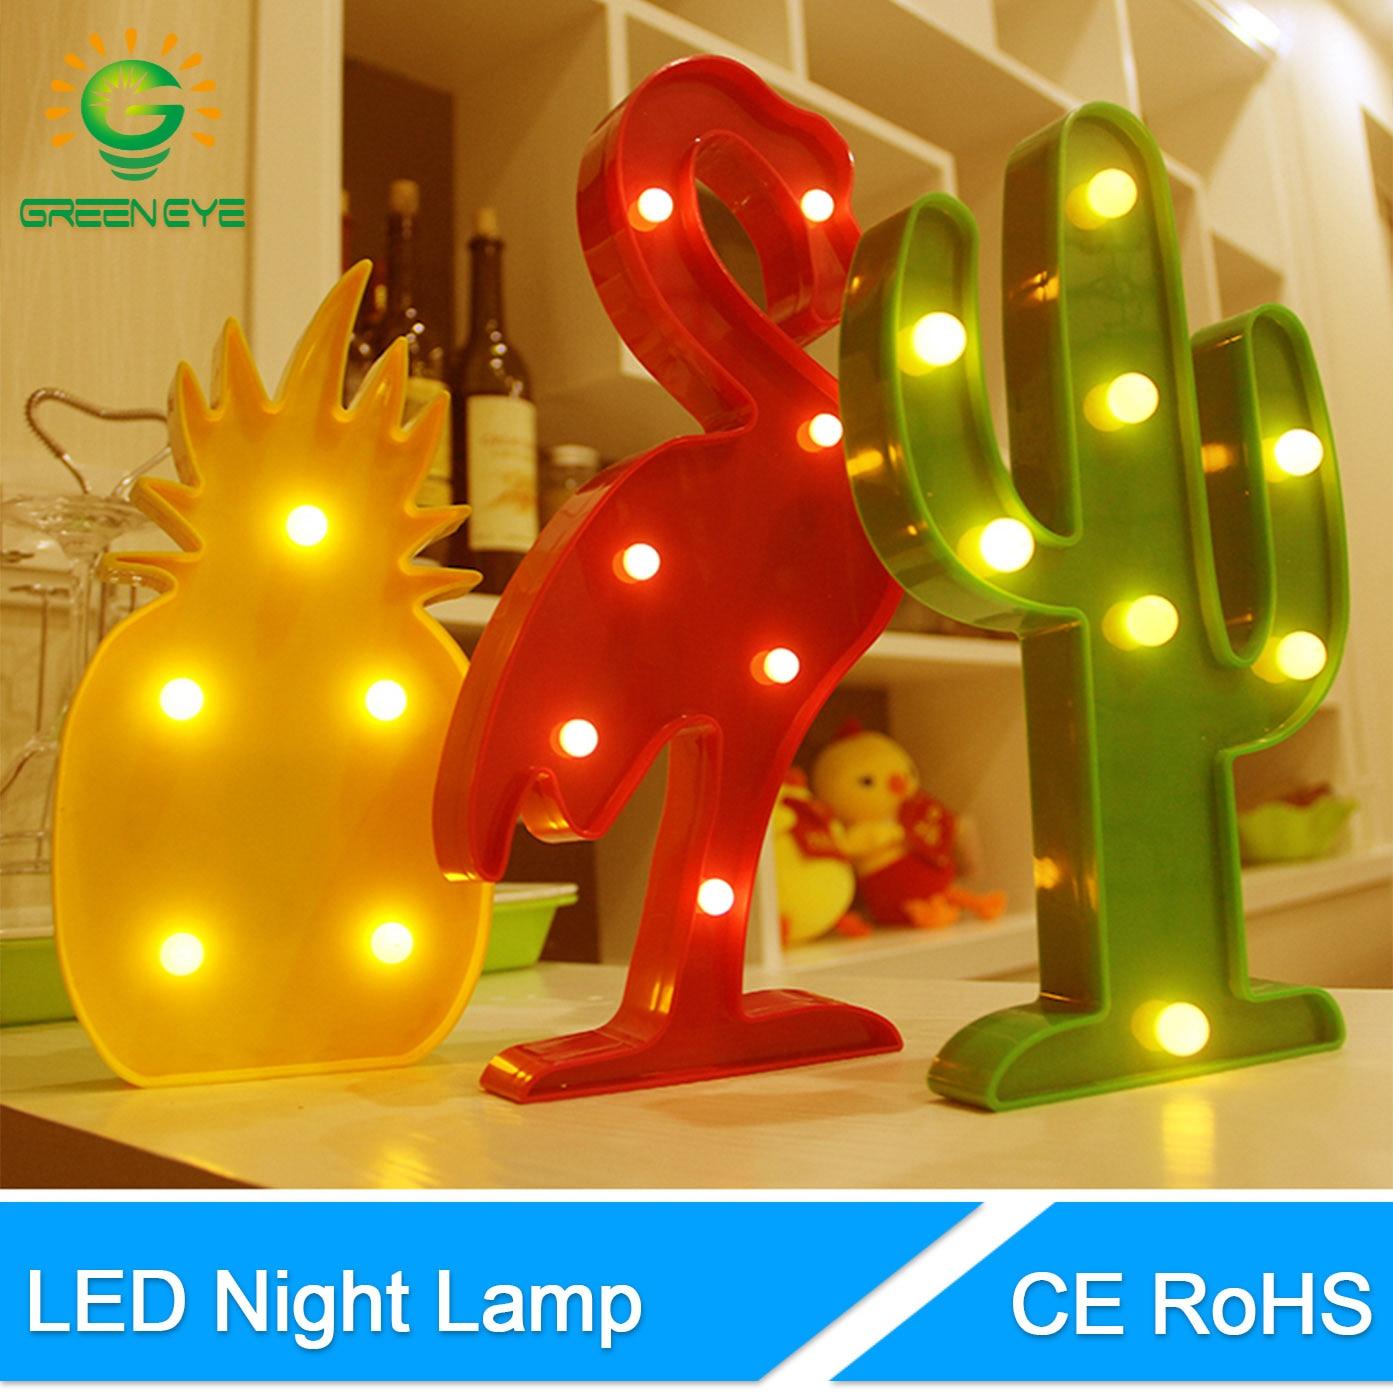 GreenEye Flamingo Pineapple Cactus Novelty LED Night Light Battery Powered Lamp Bulb Nightlight For Kids Bar Bedside Lamp Party